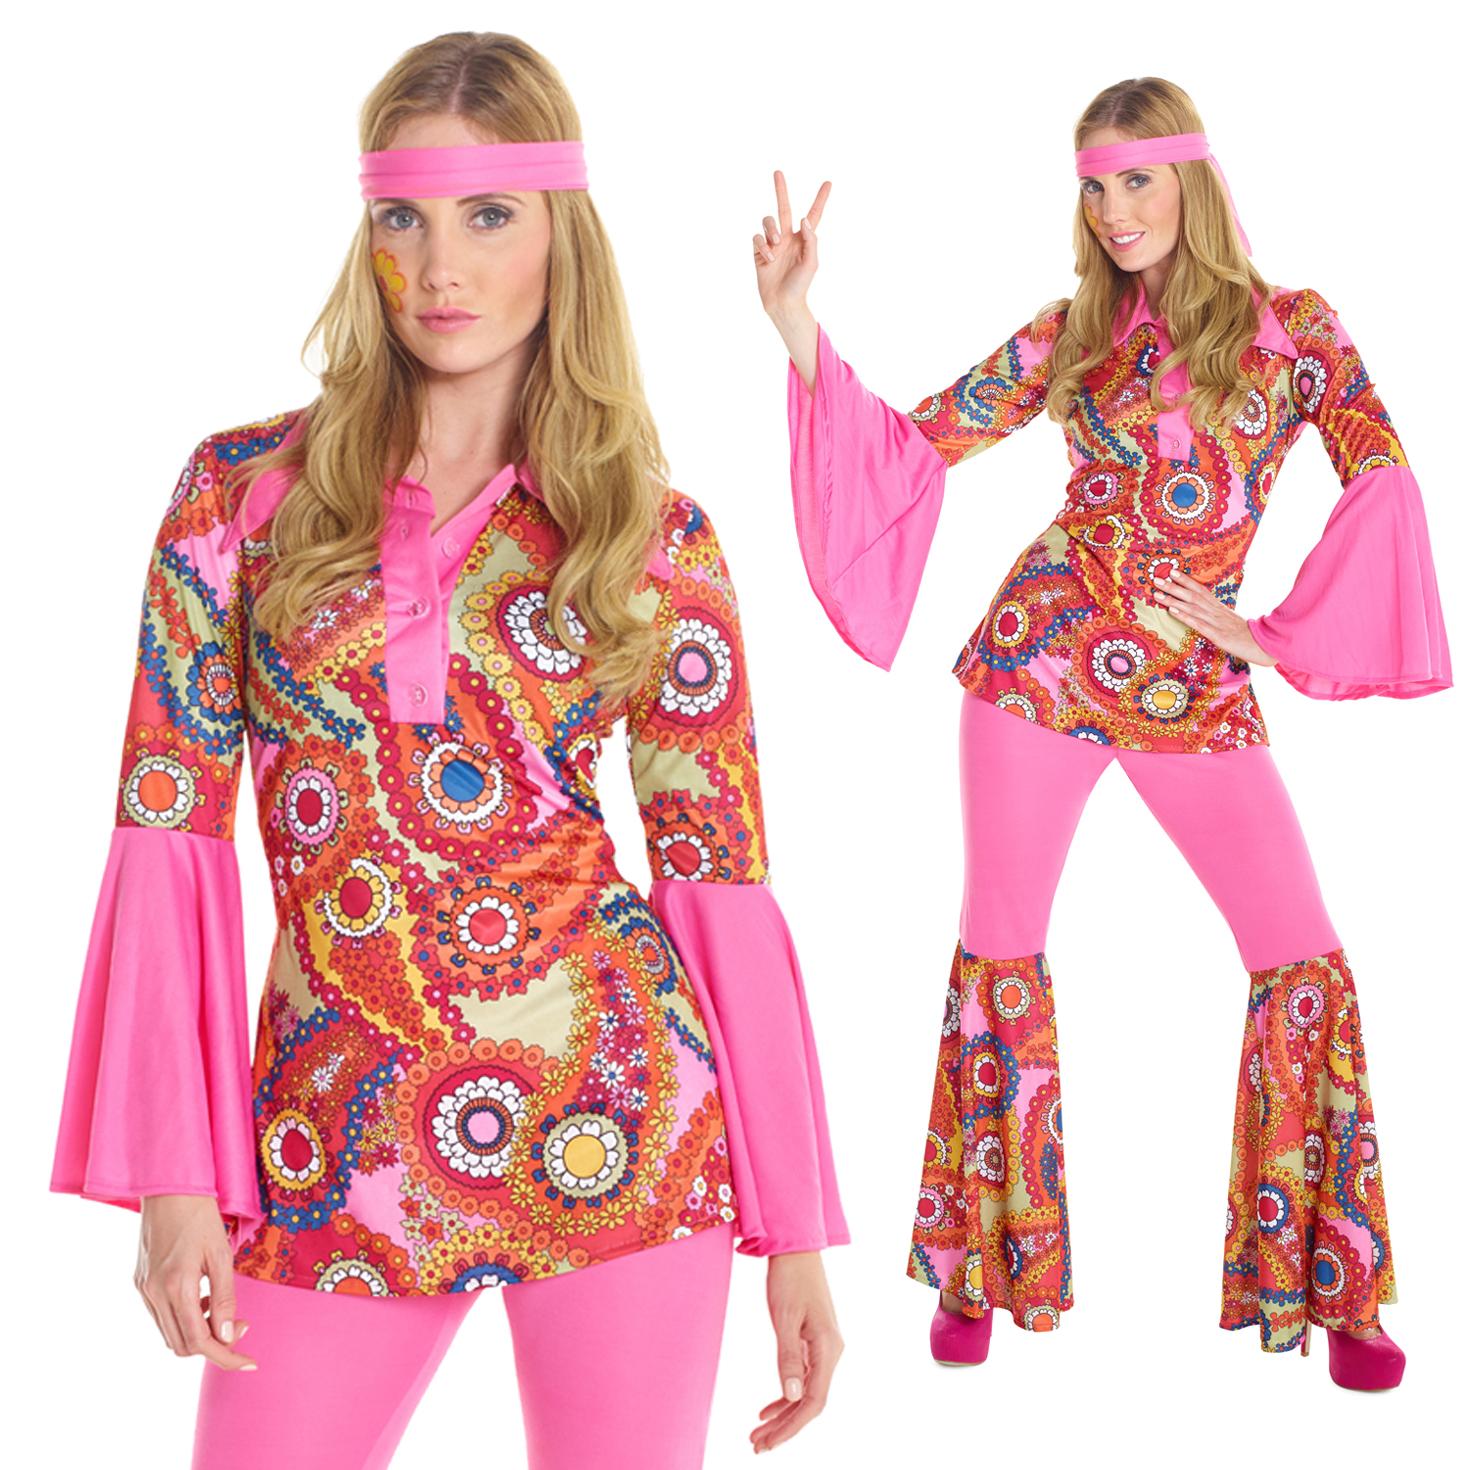 womens hippie costume 60s 70s ladies groovy hippy fancy